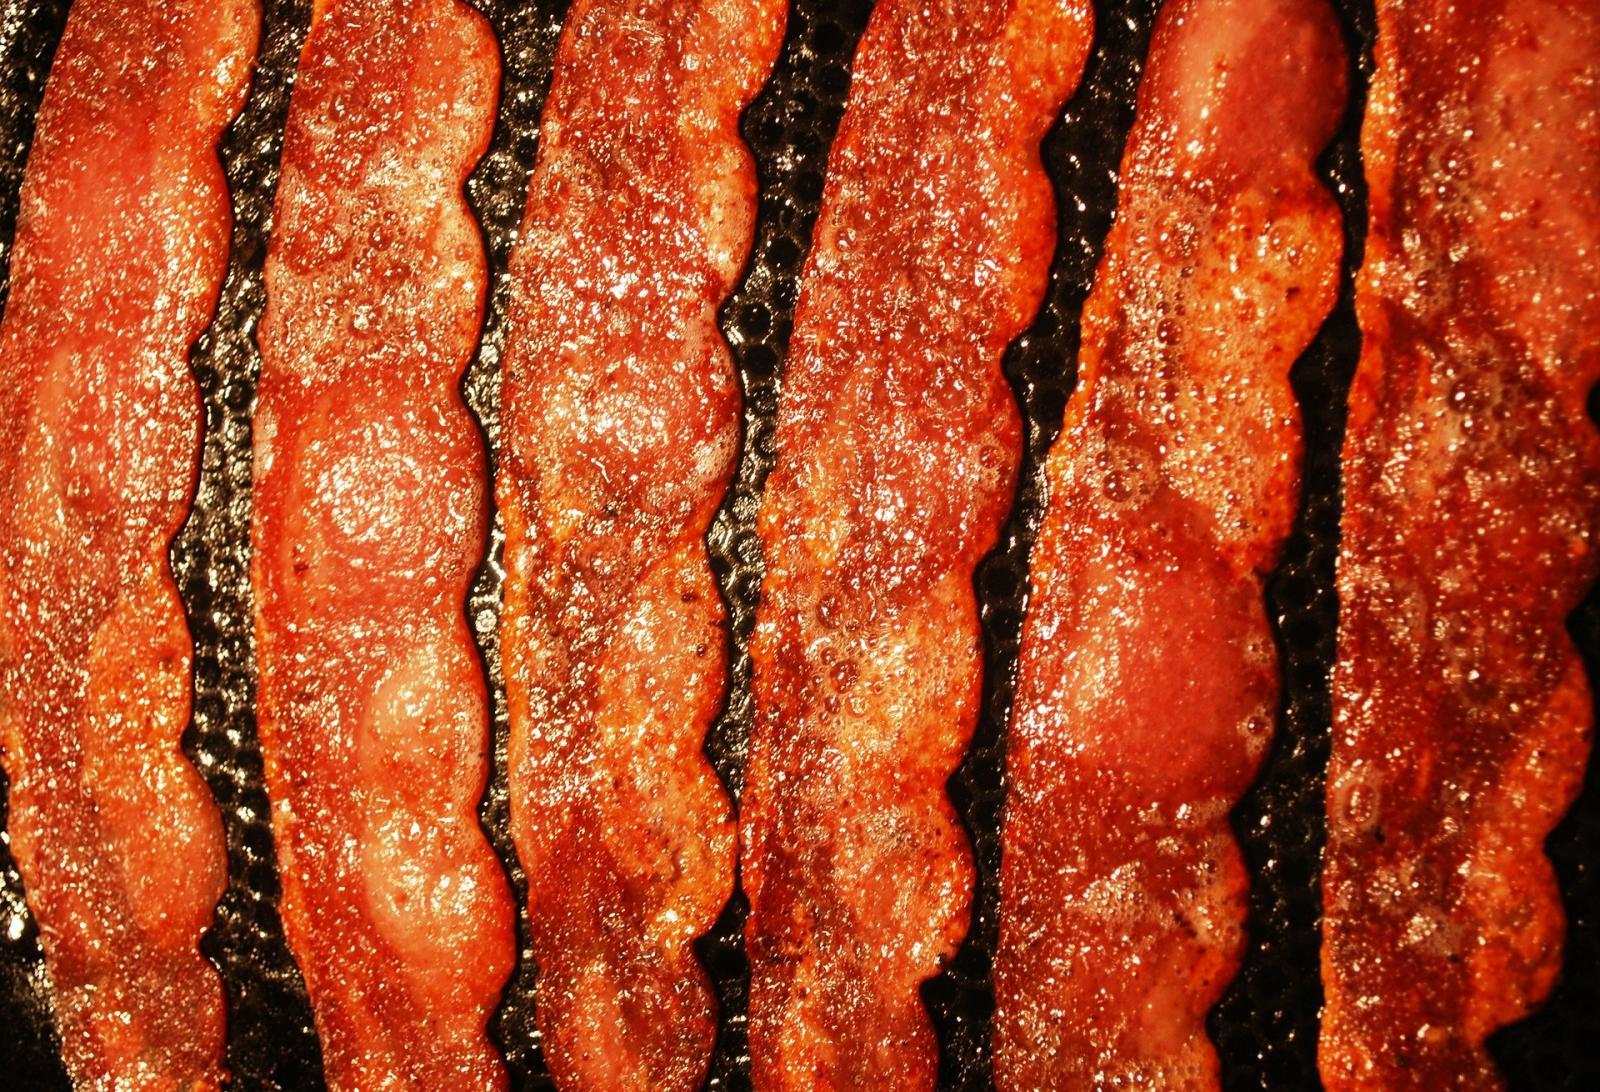 Frying bacon. Photo credit: Pixabay